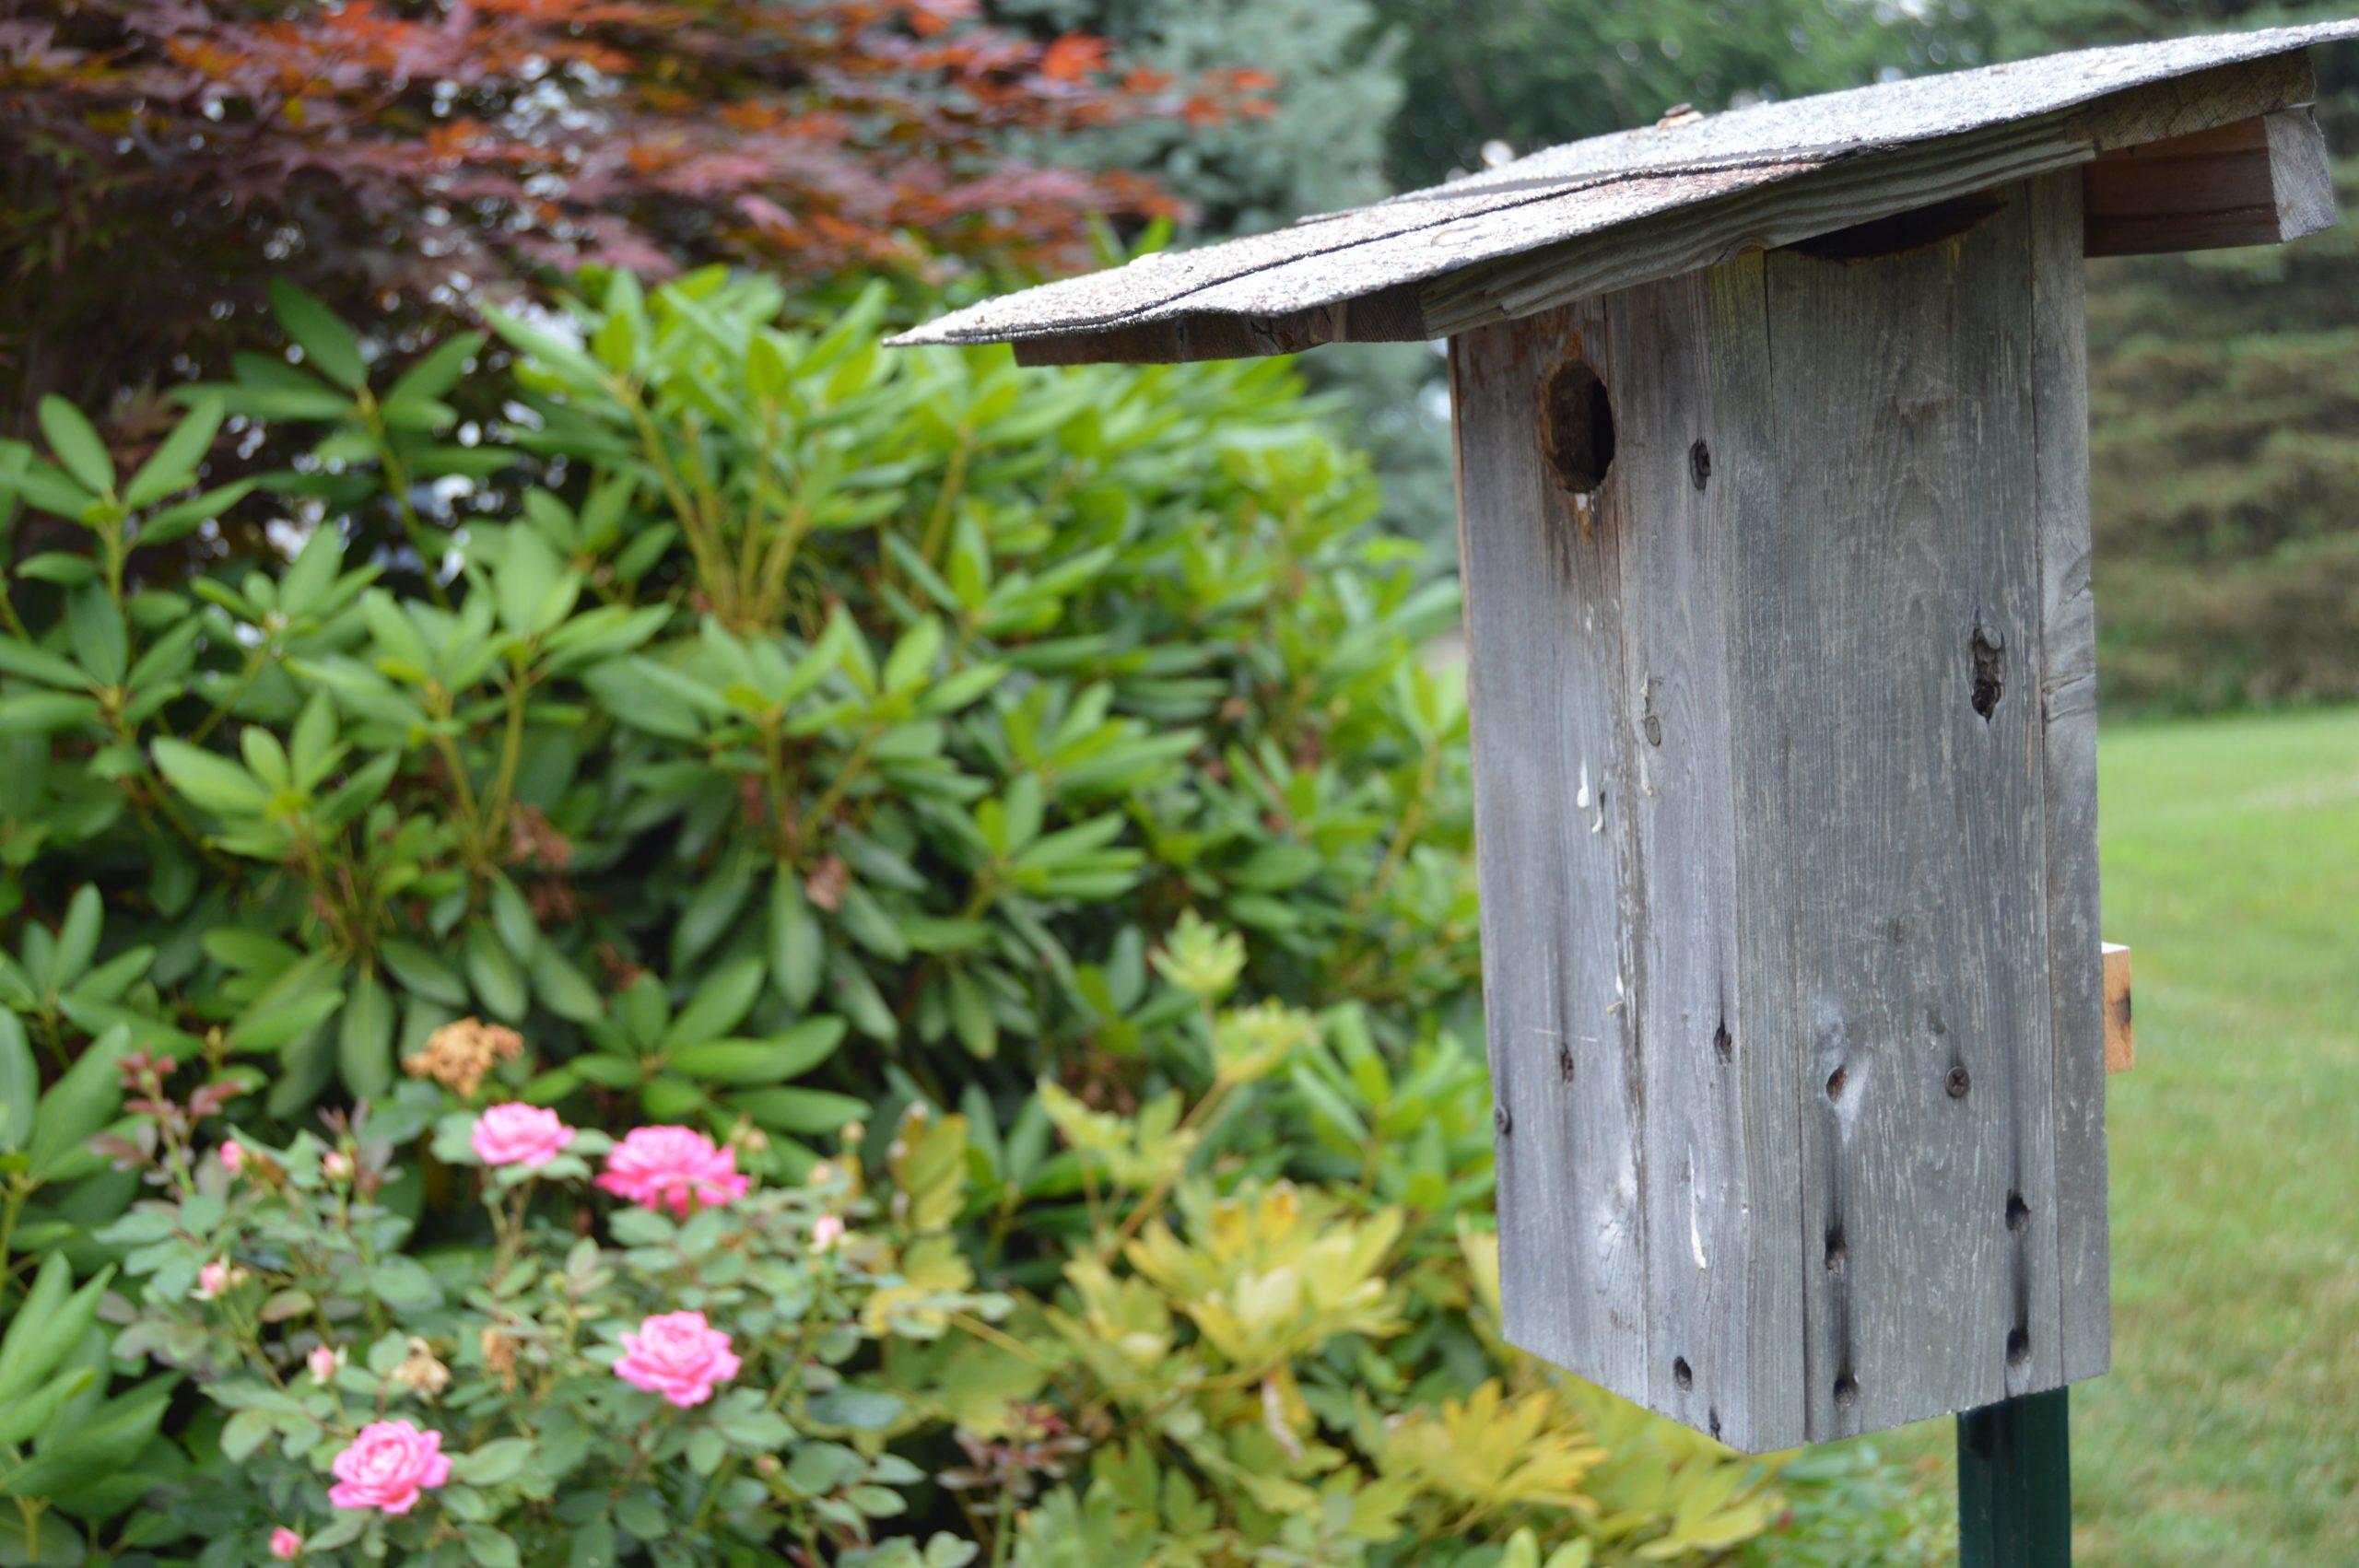 Ken-Leisters-bluebird-box.-Photo-by-Blake-Goll